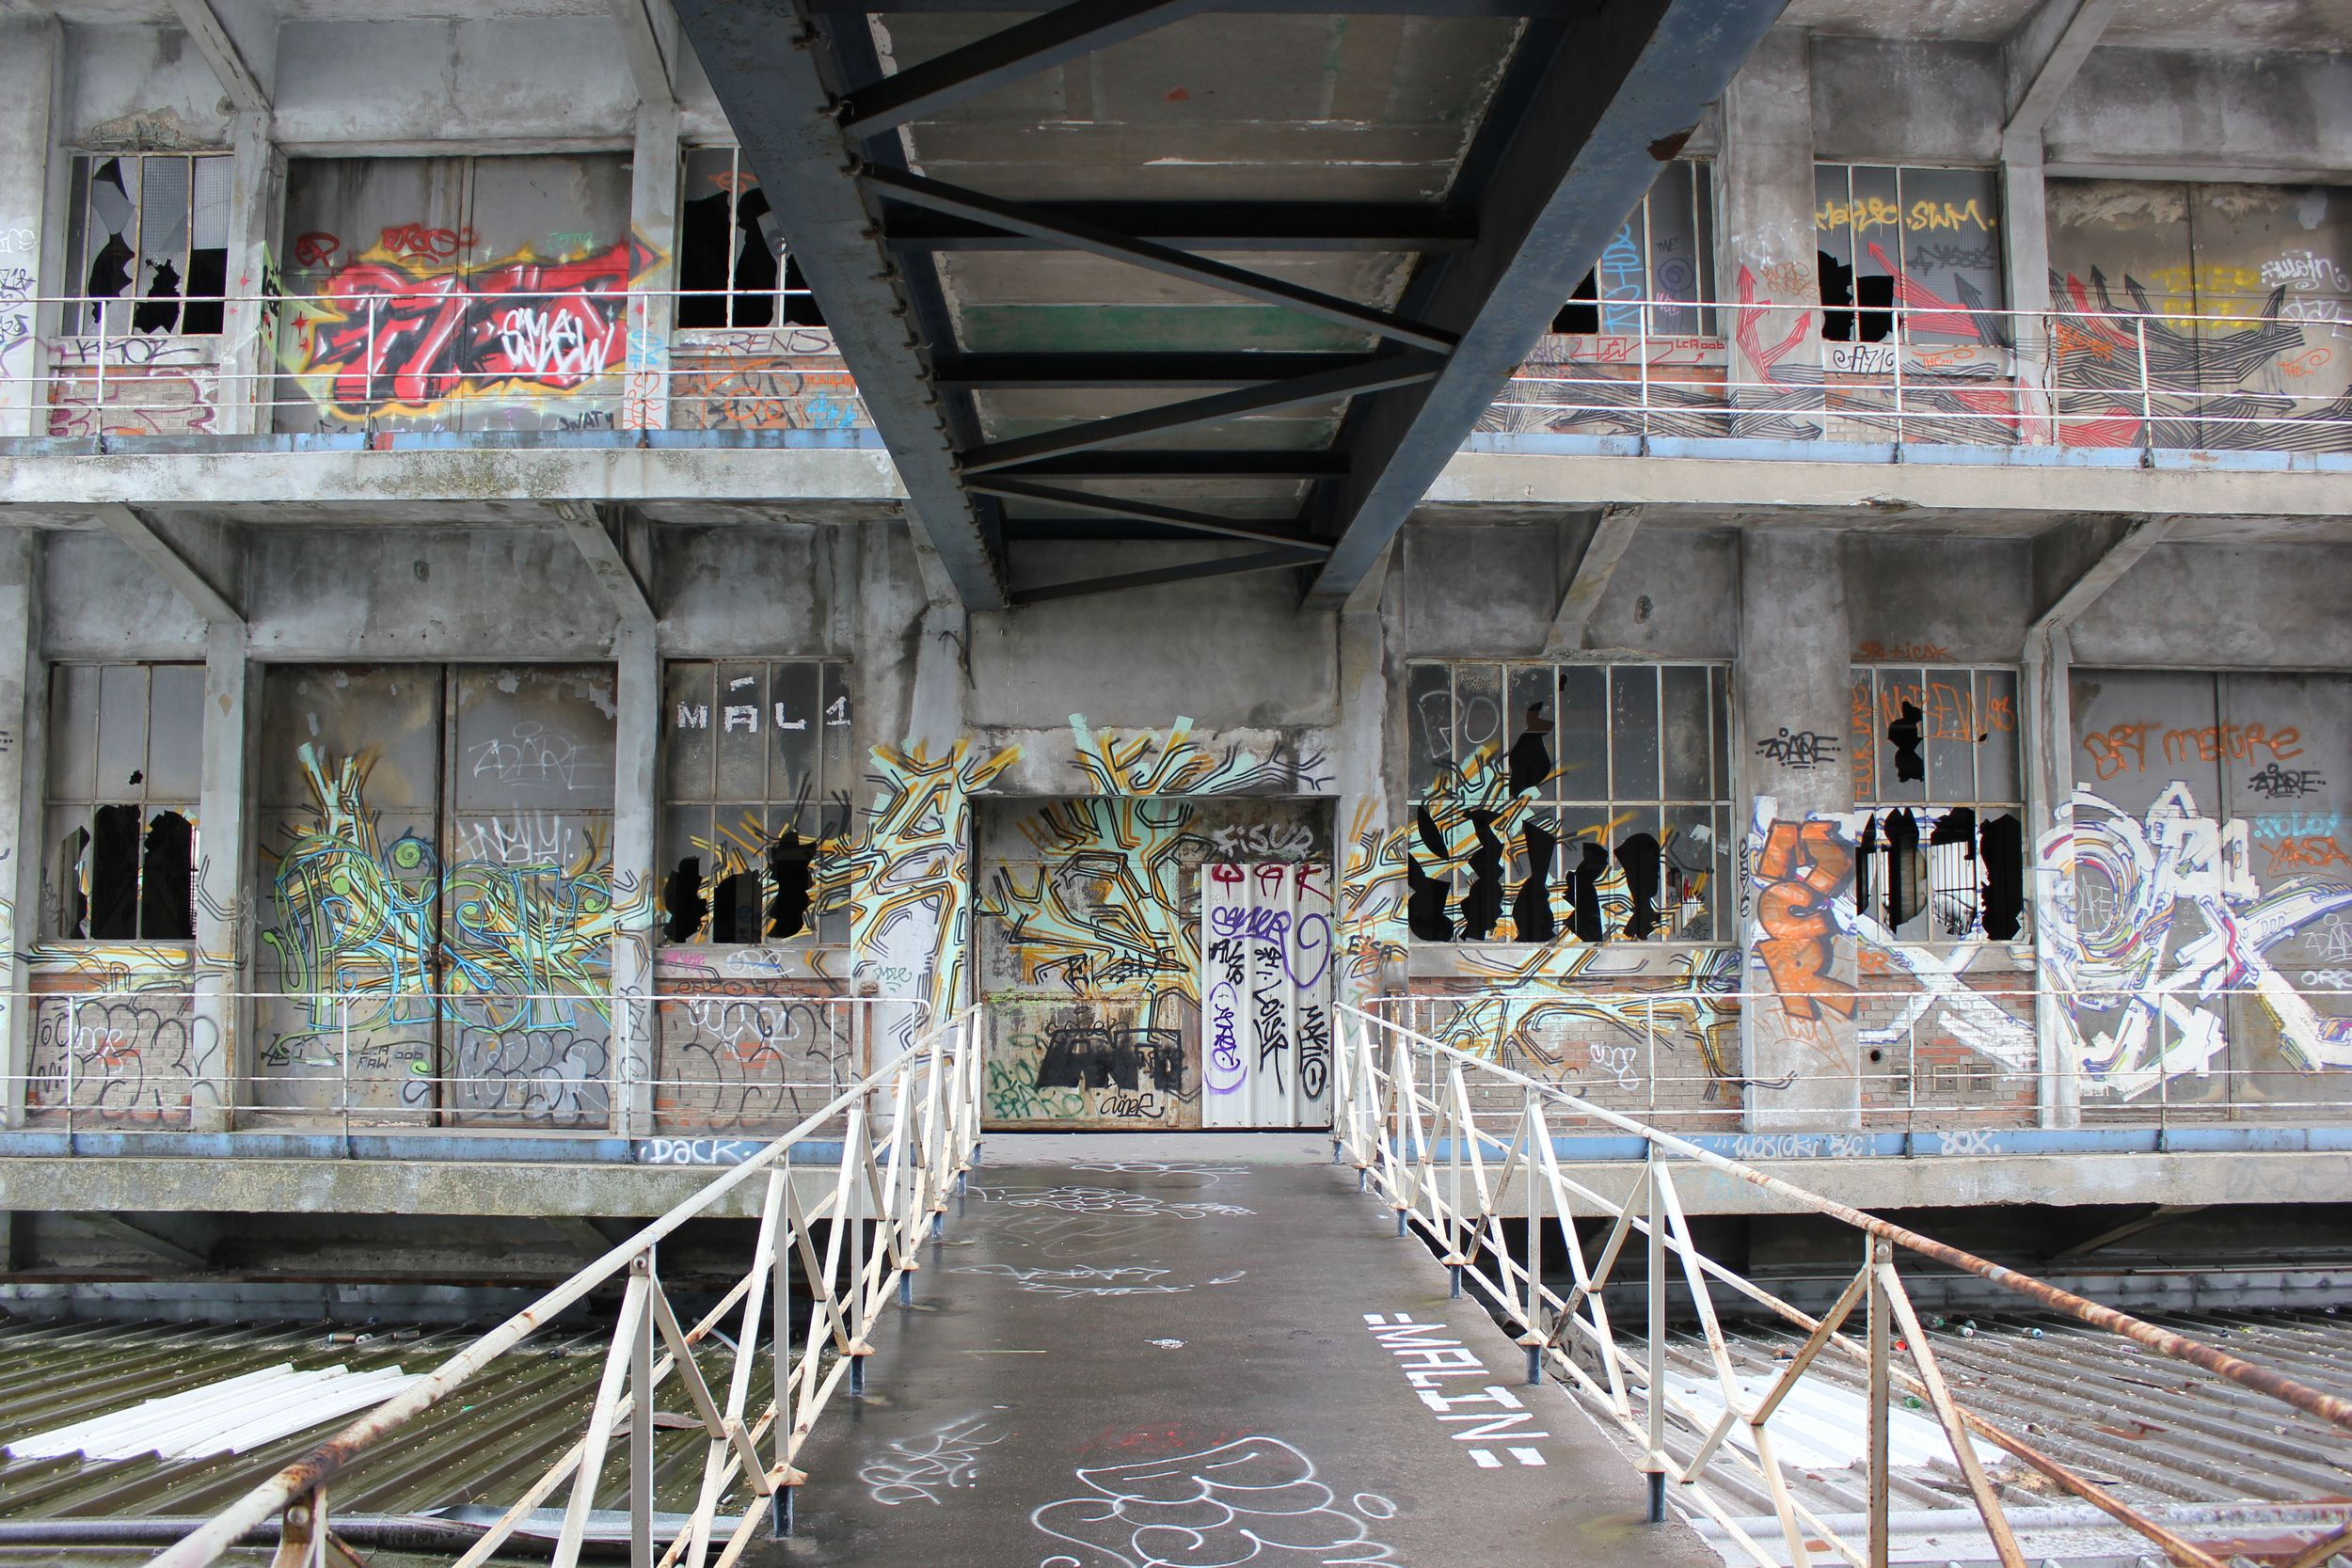 Magasins généraux en 2012 street art été du Canal